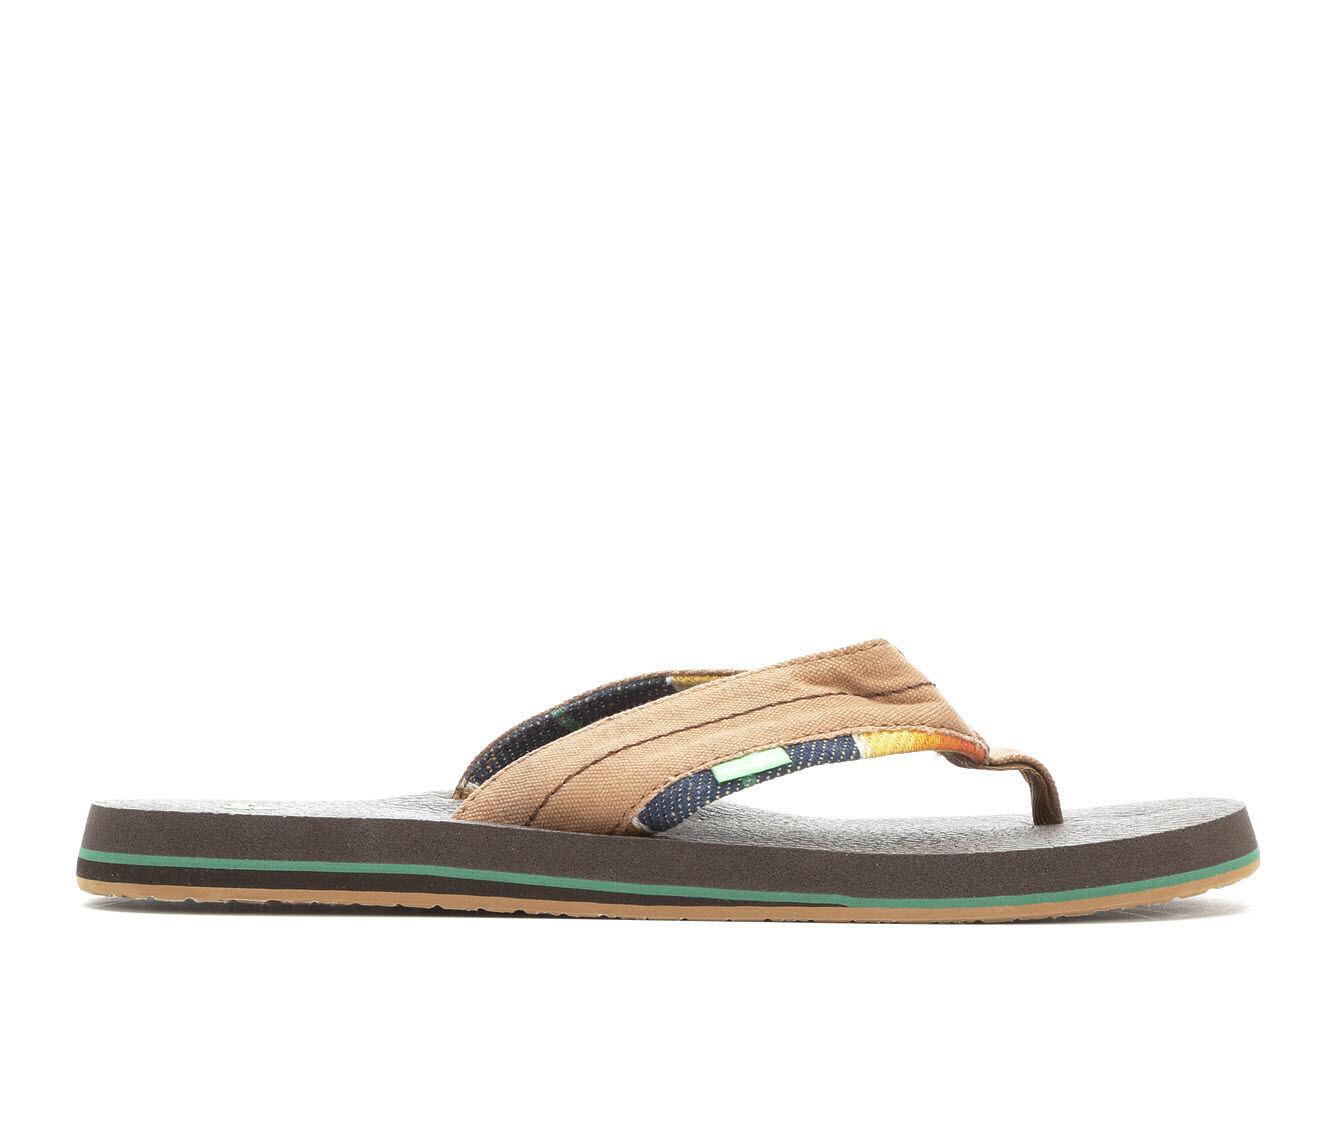 uk shoes_kd2584